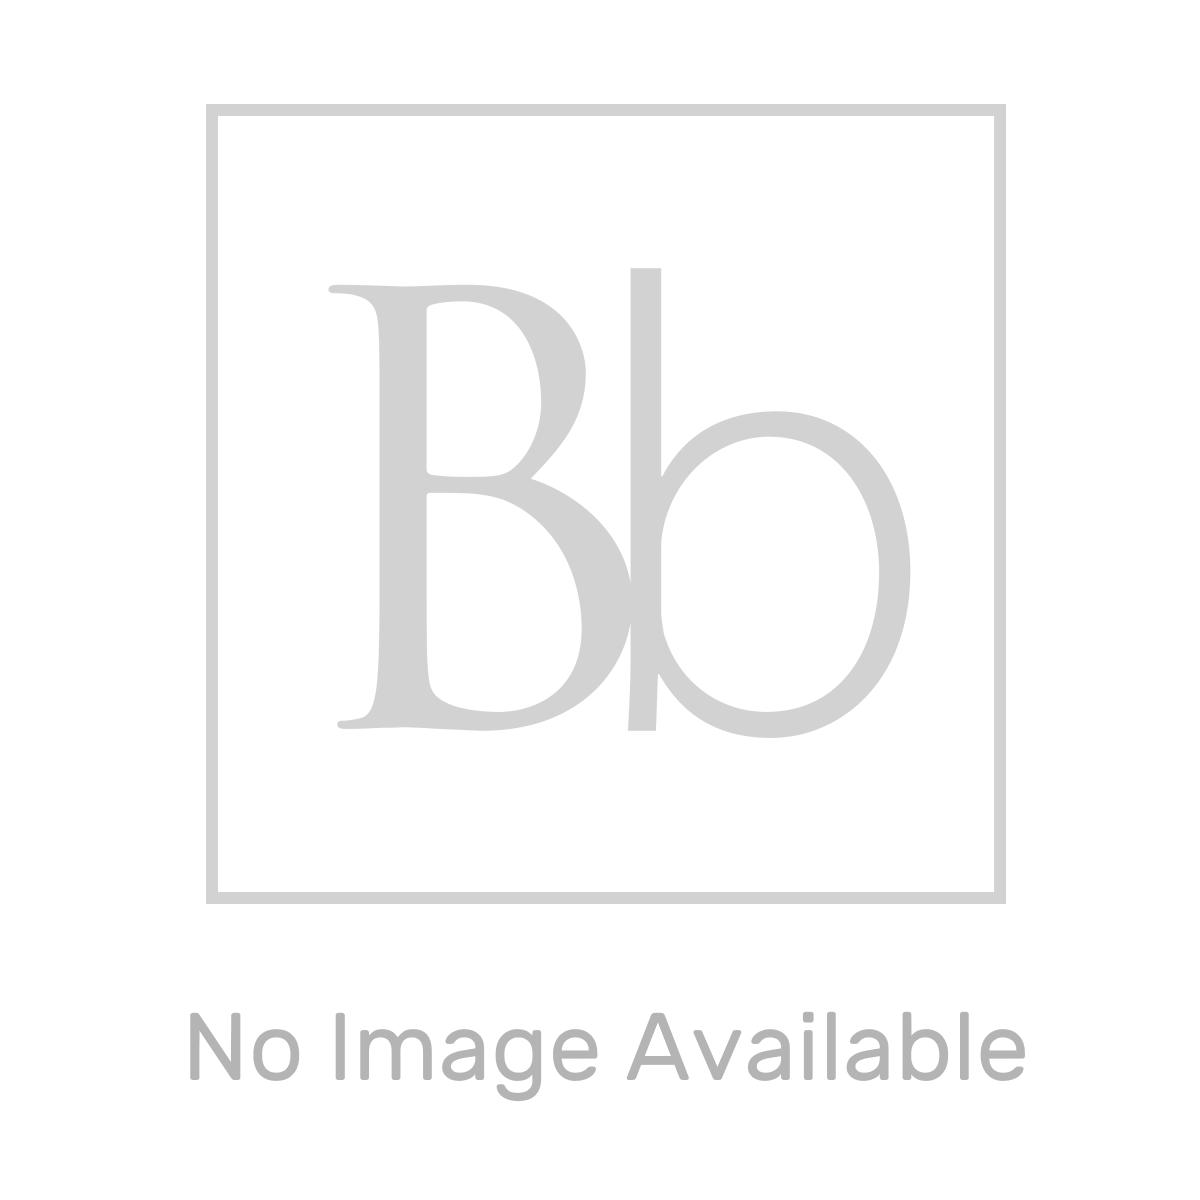 RAK R Range Black Chrome Mono Basin Mixer Tap Measurements